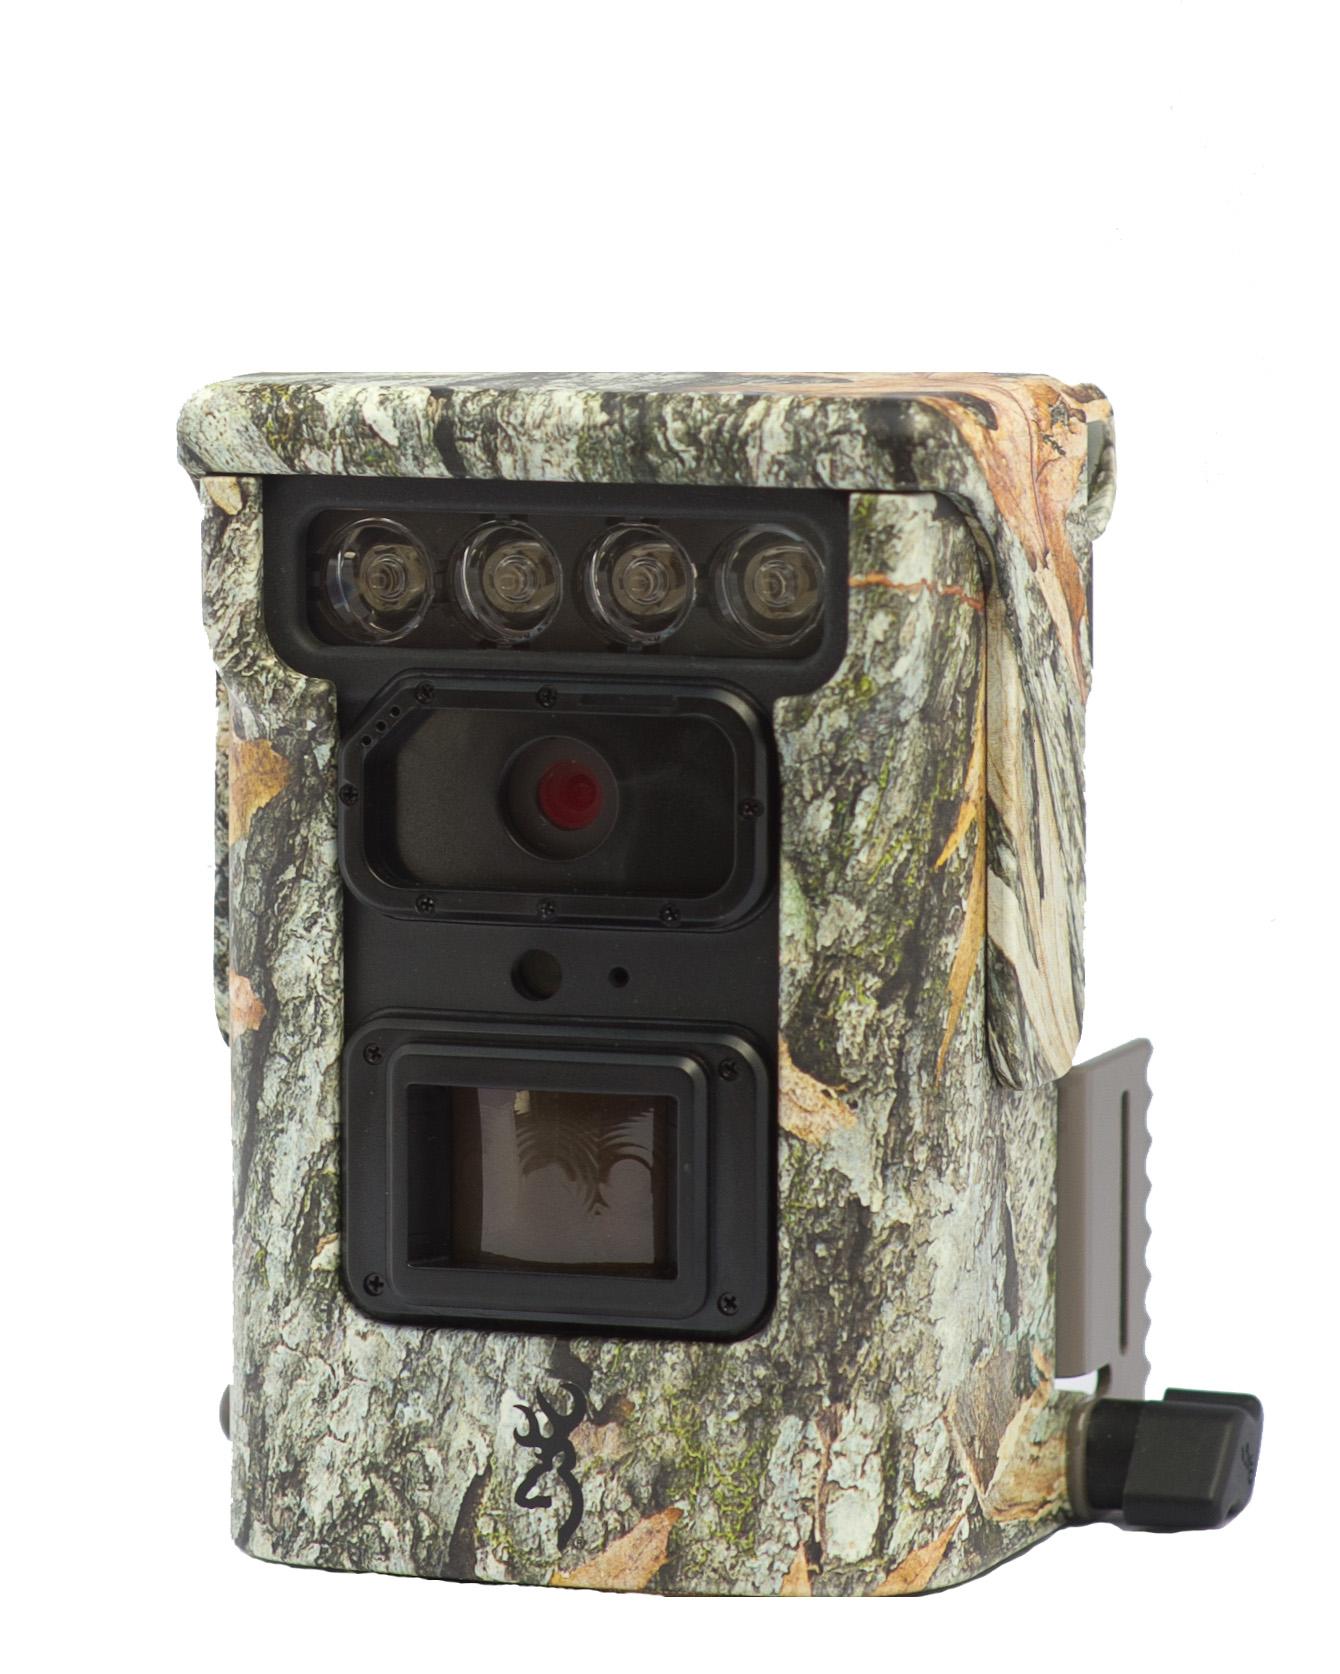 2017 Browning Trail Cameras Defender 850